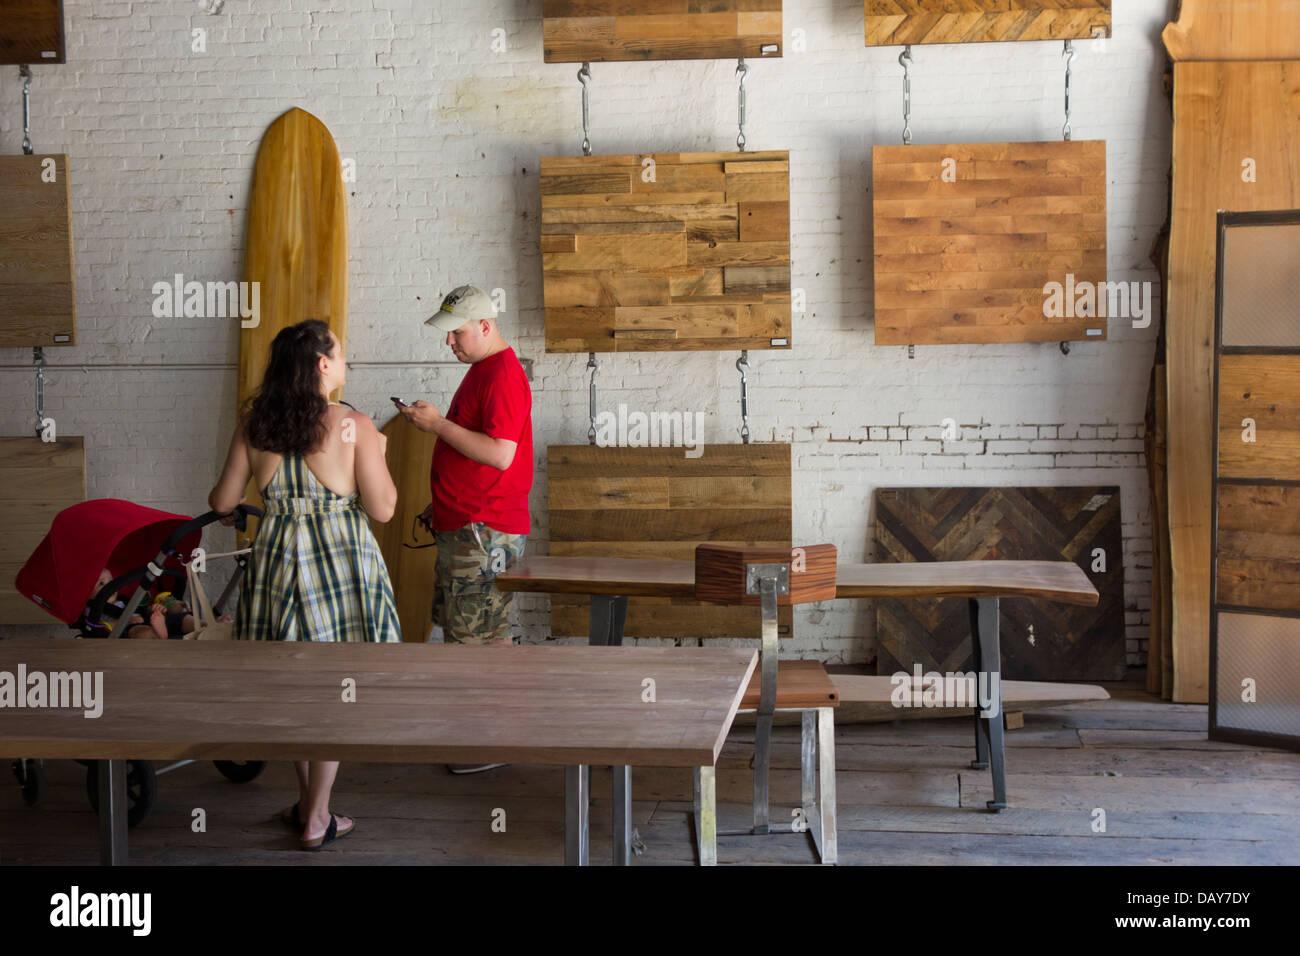 Mark Jupiter Custom Furniture In DUMBO Brooklyn